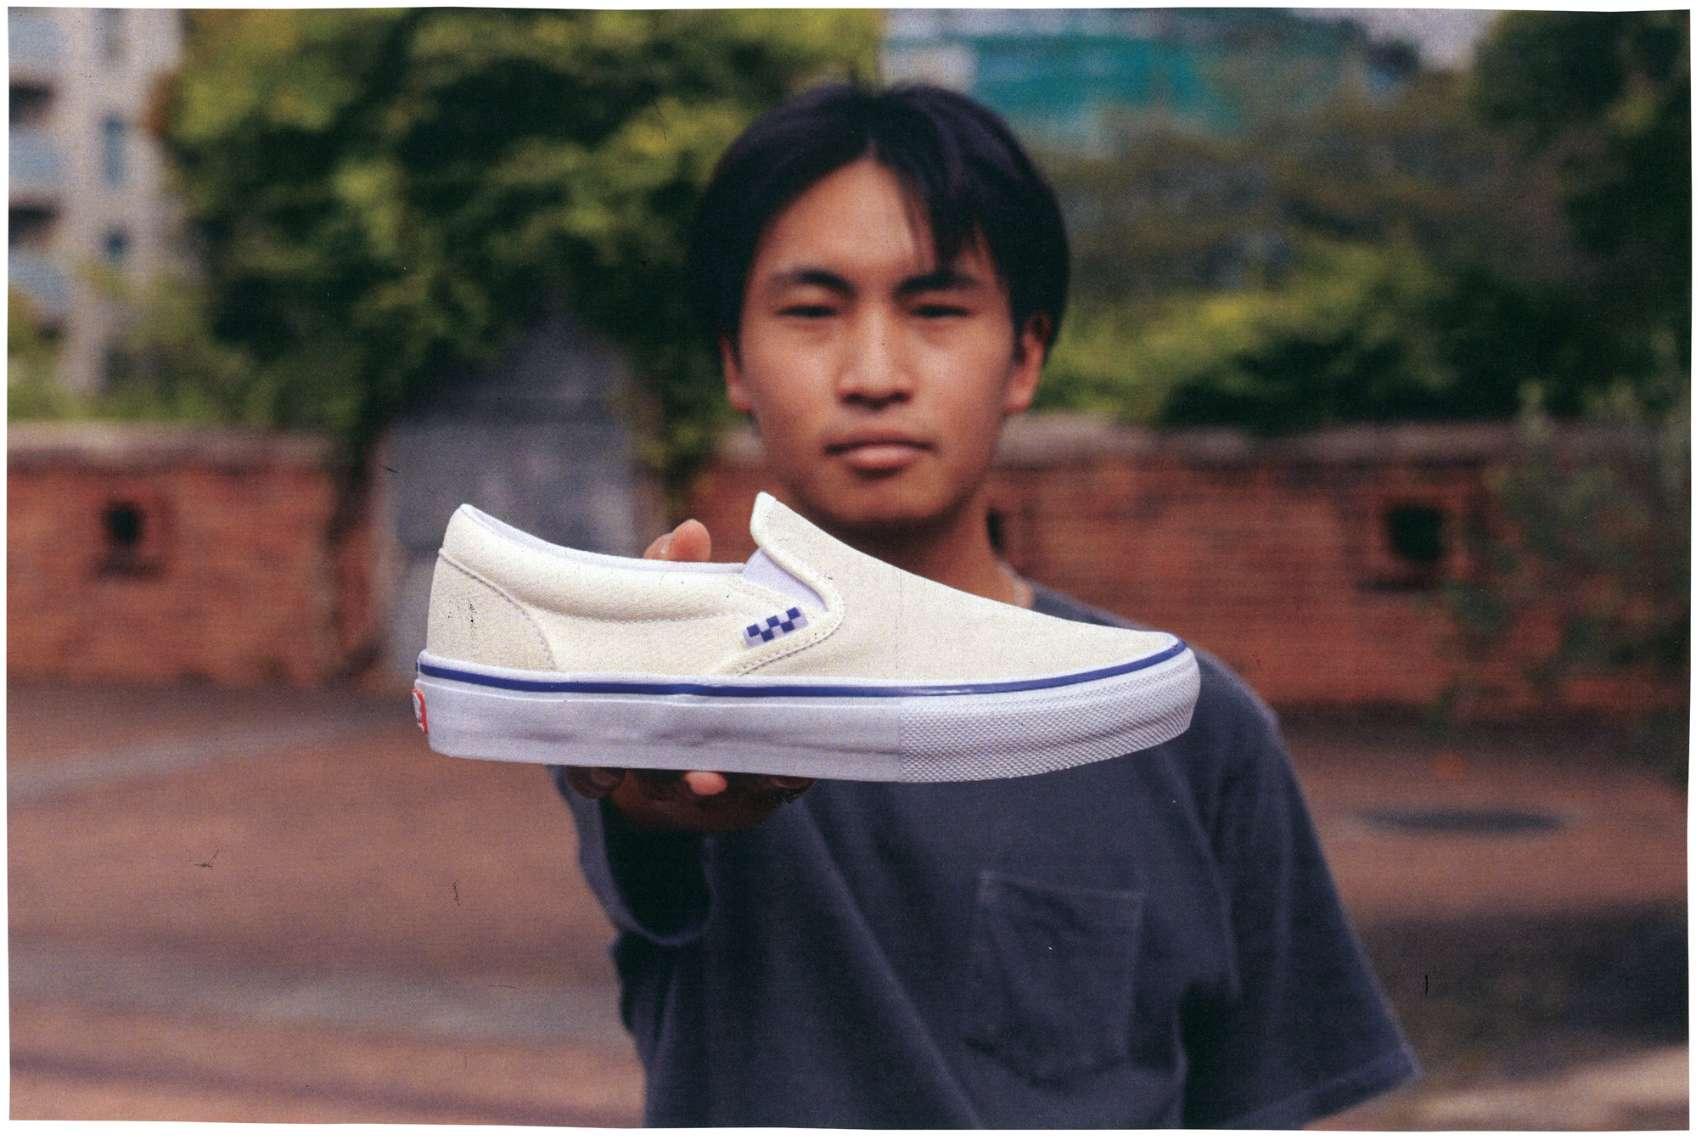 Daiki Hoshino x Skate Slip On